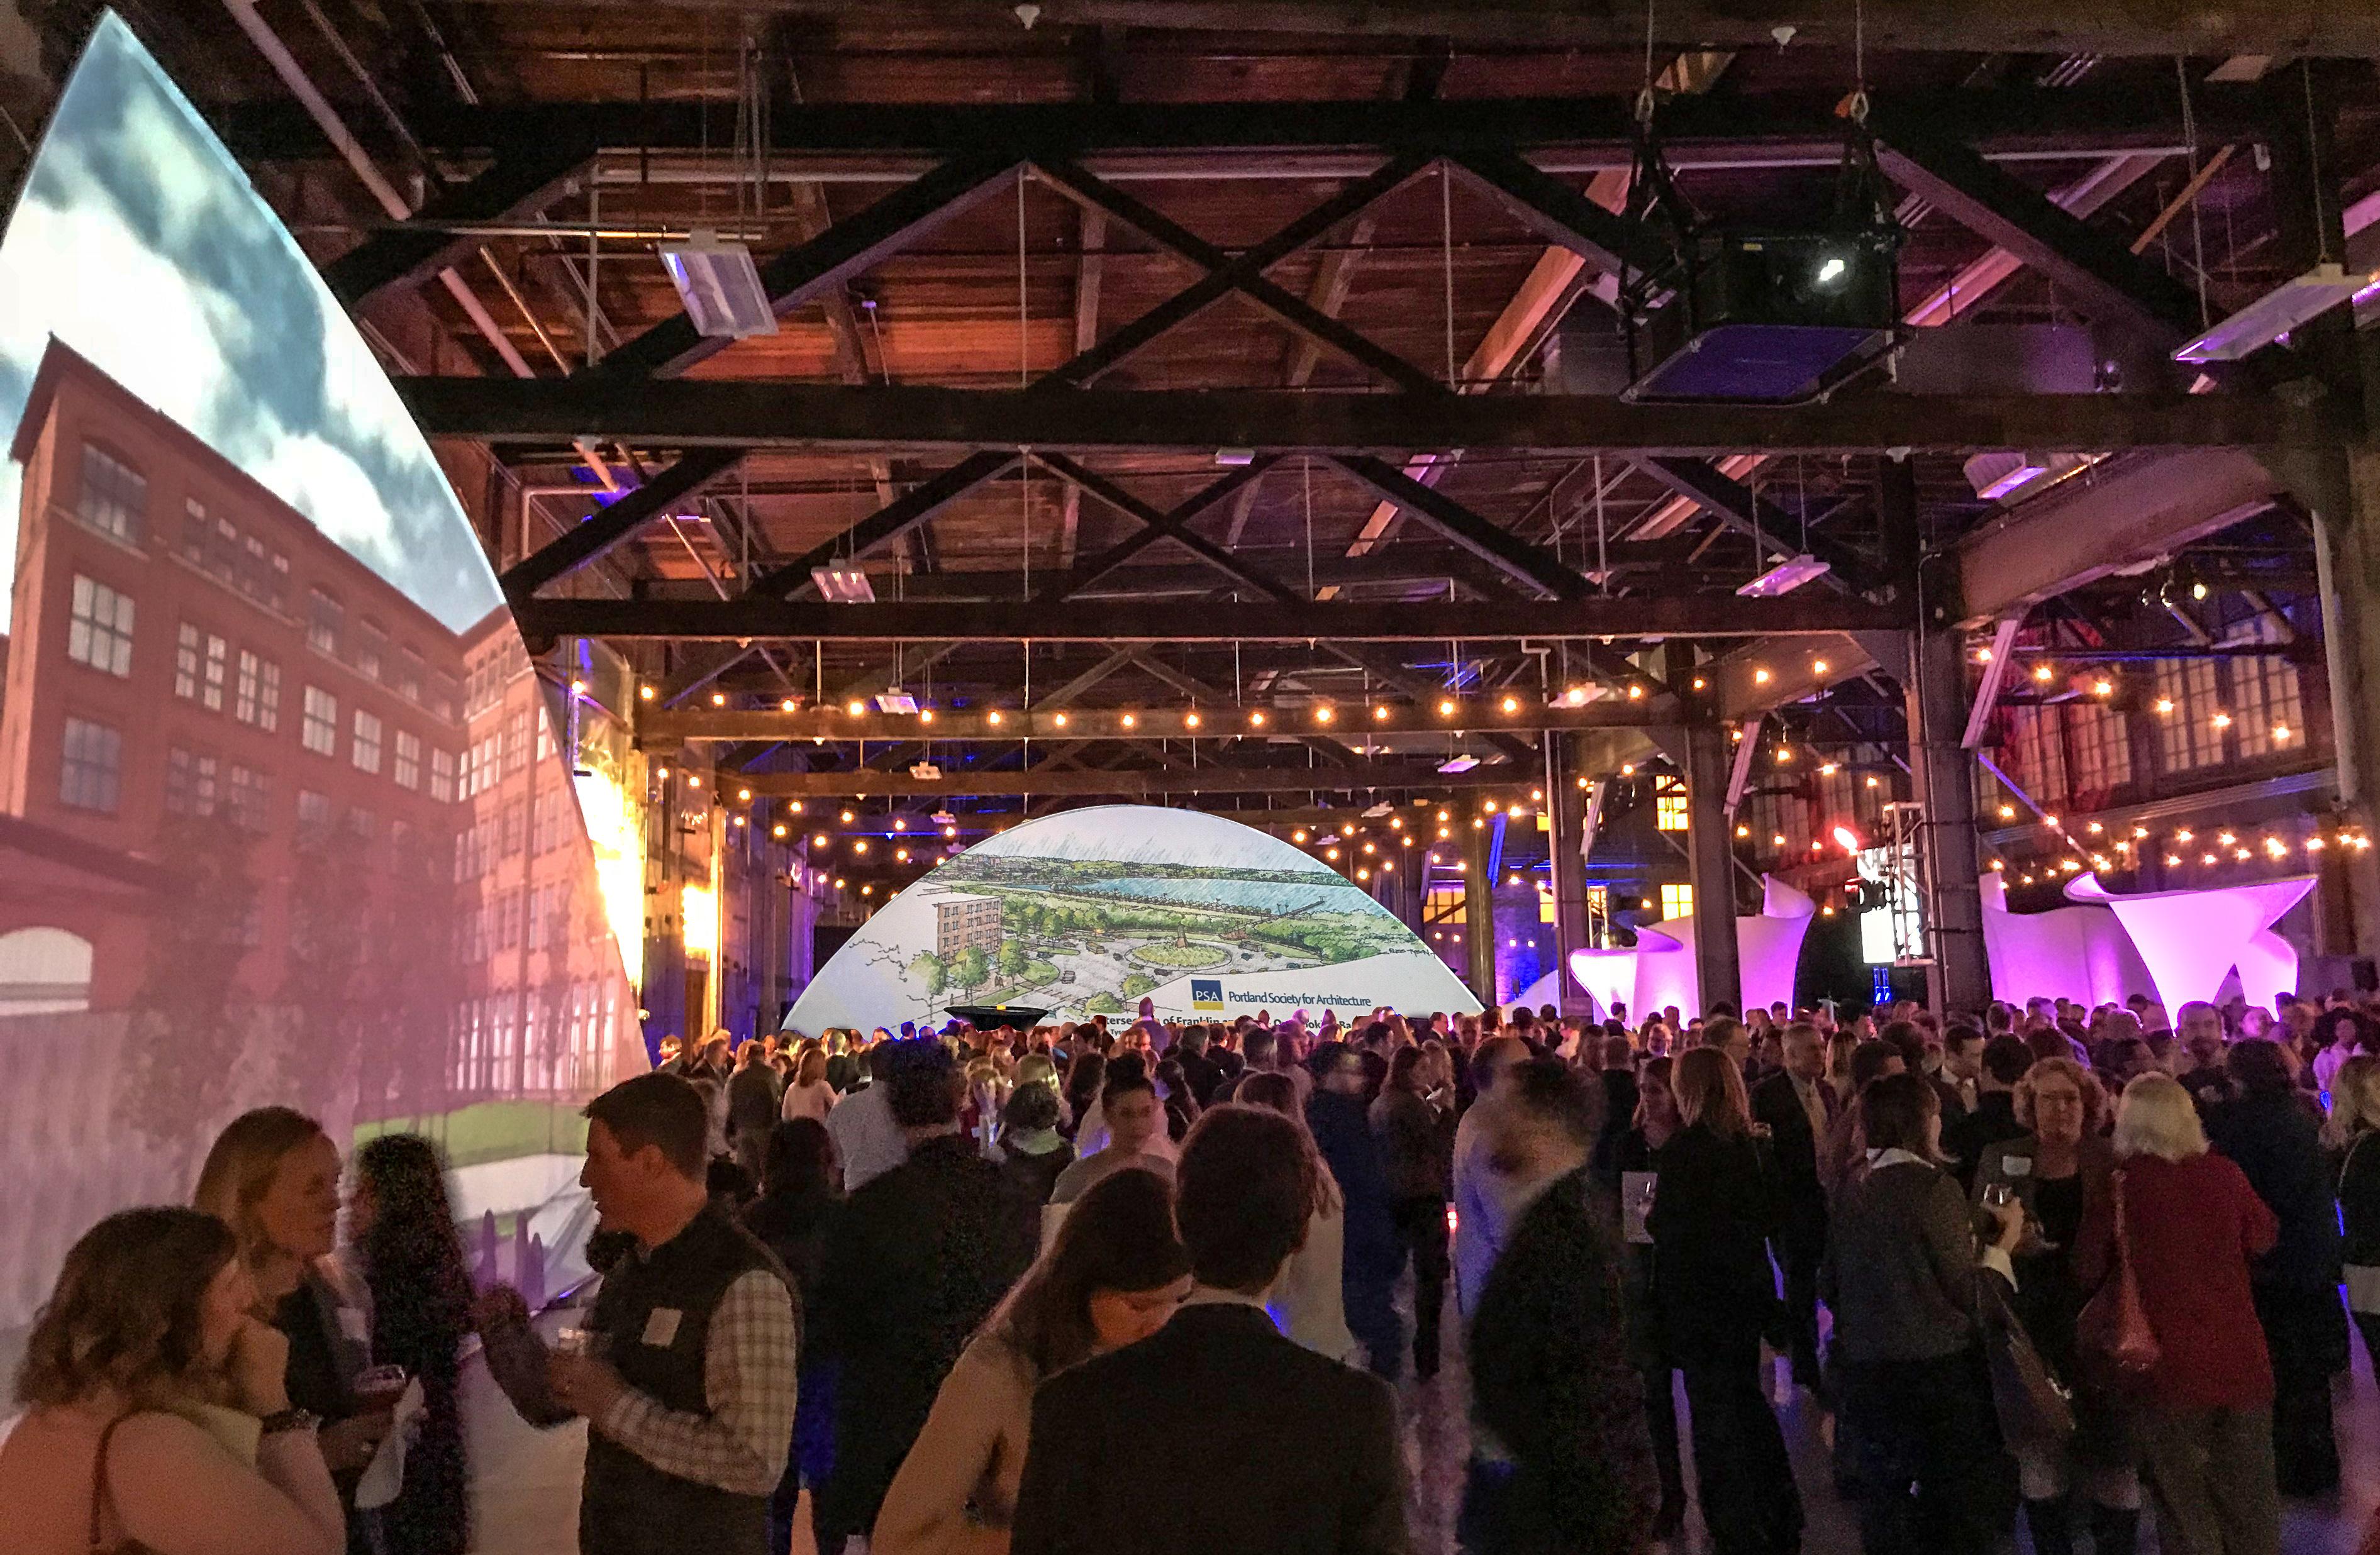 ChamberofCommerce Imagine Portland 2018 IceFloe